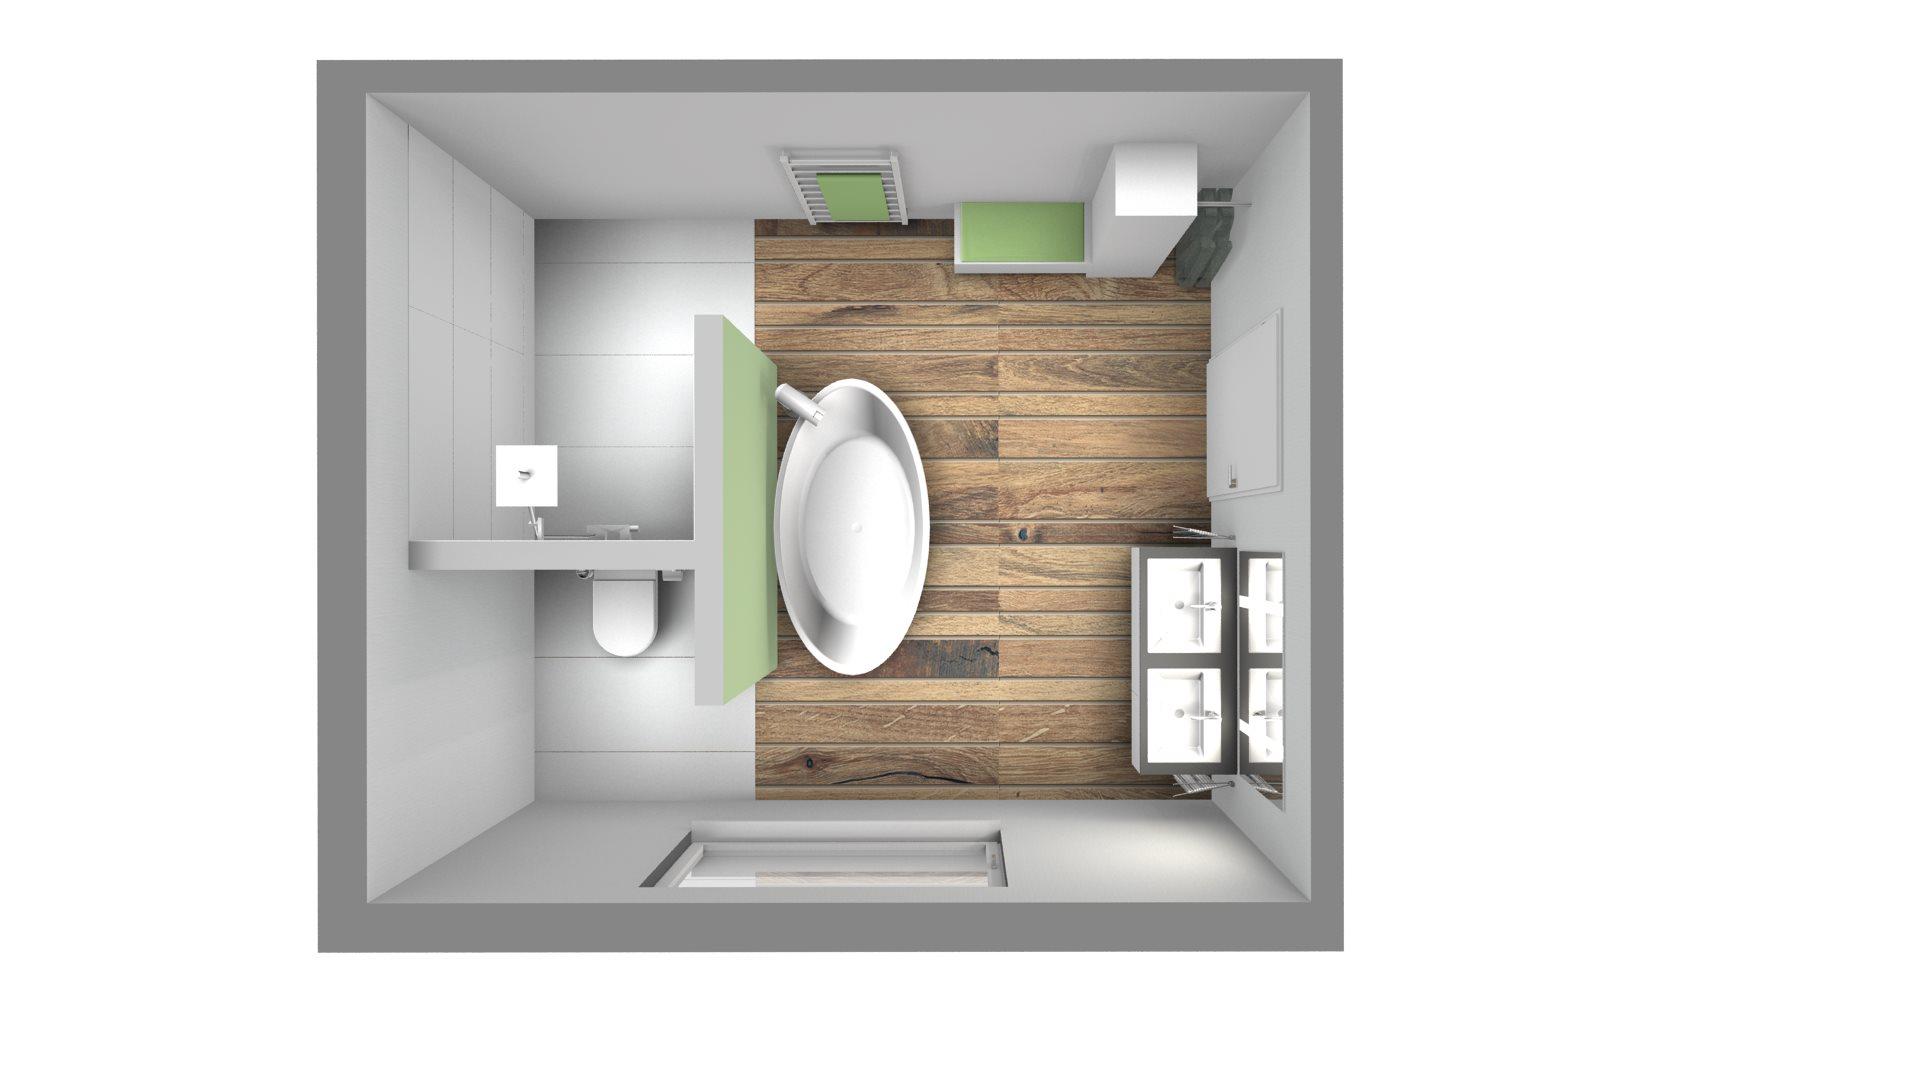 Badezimmer 3X3M